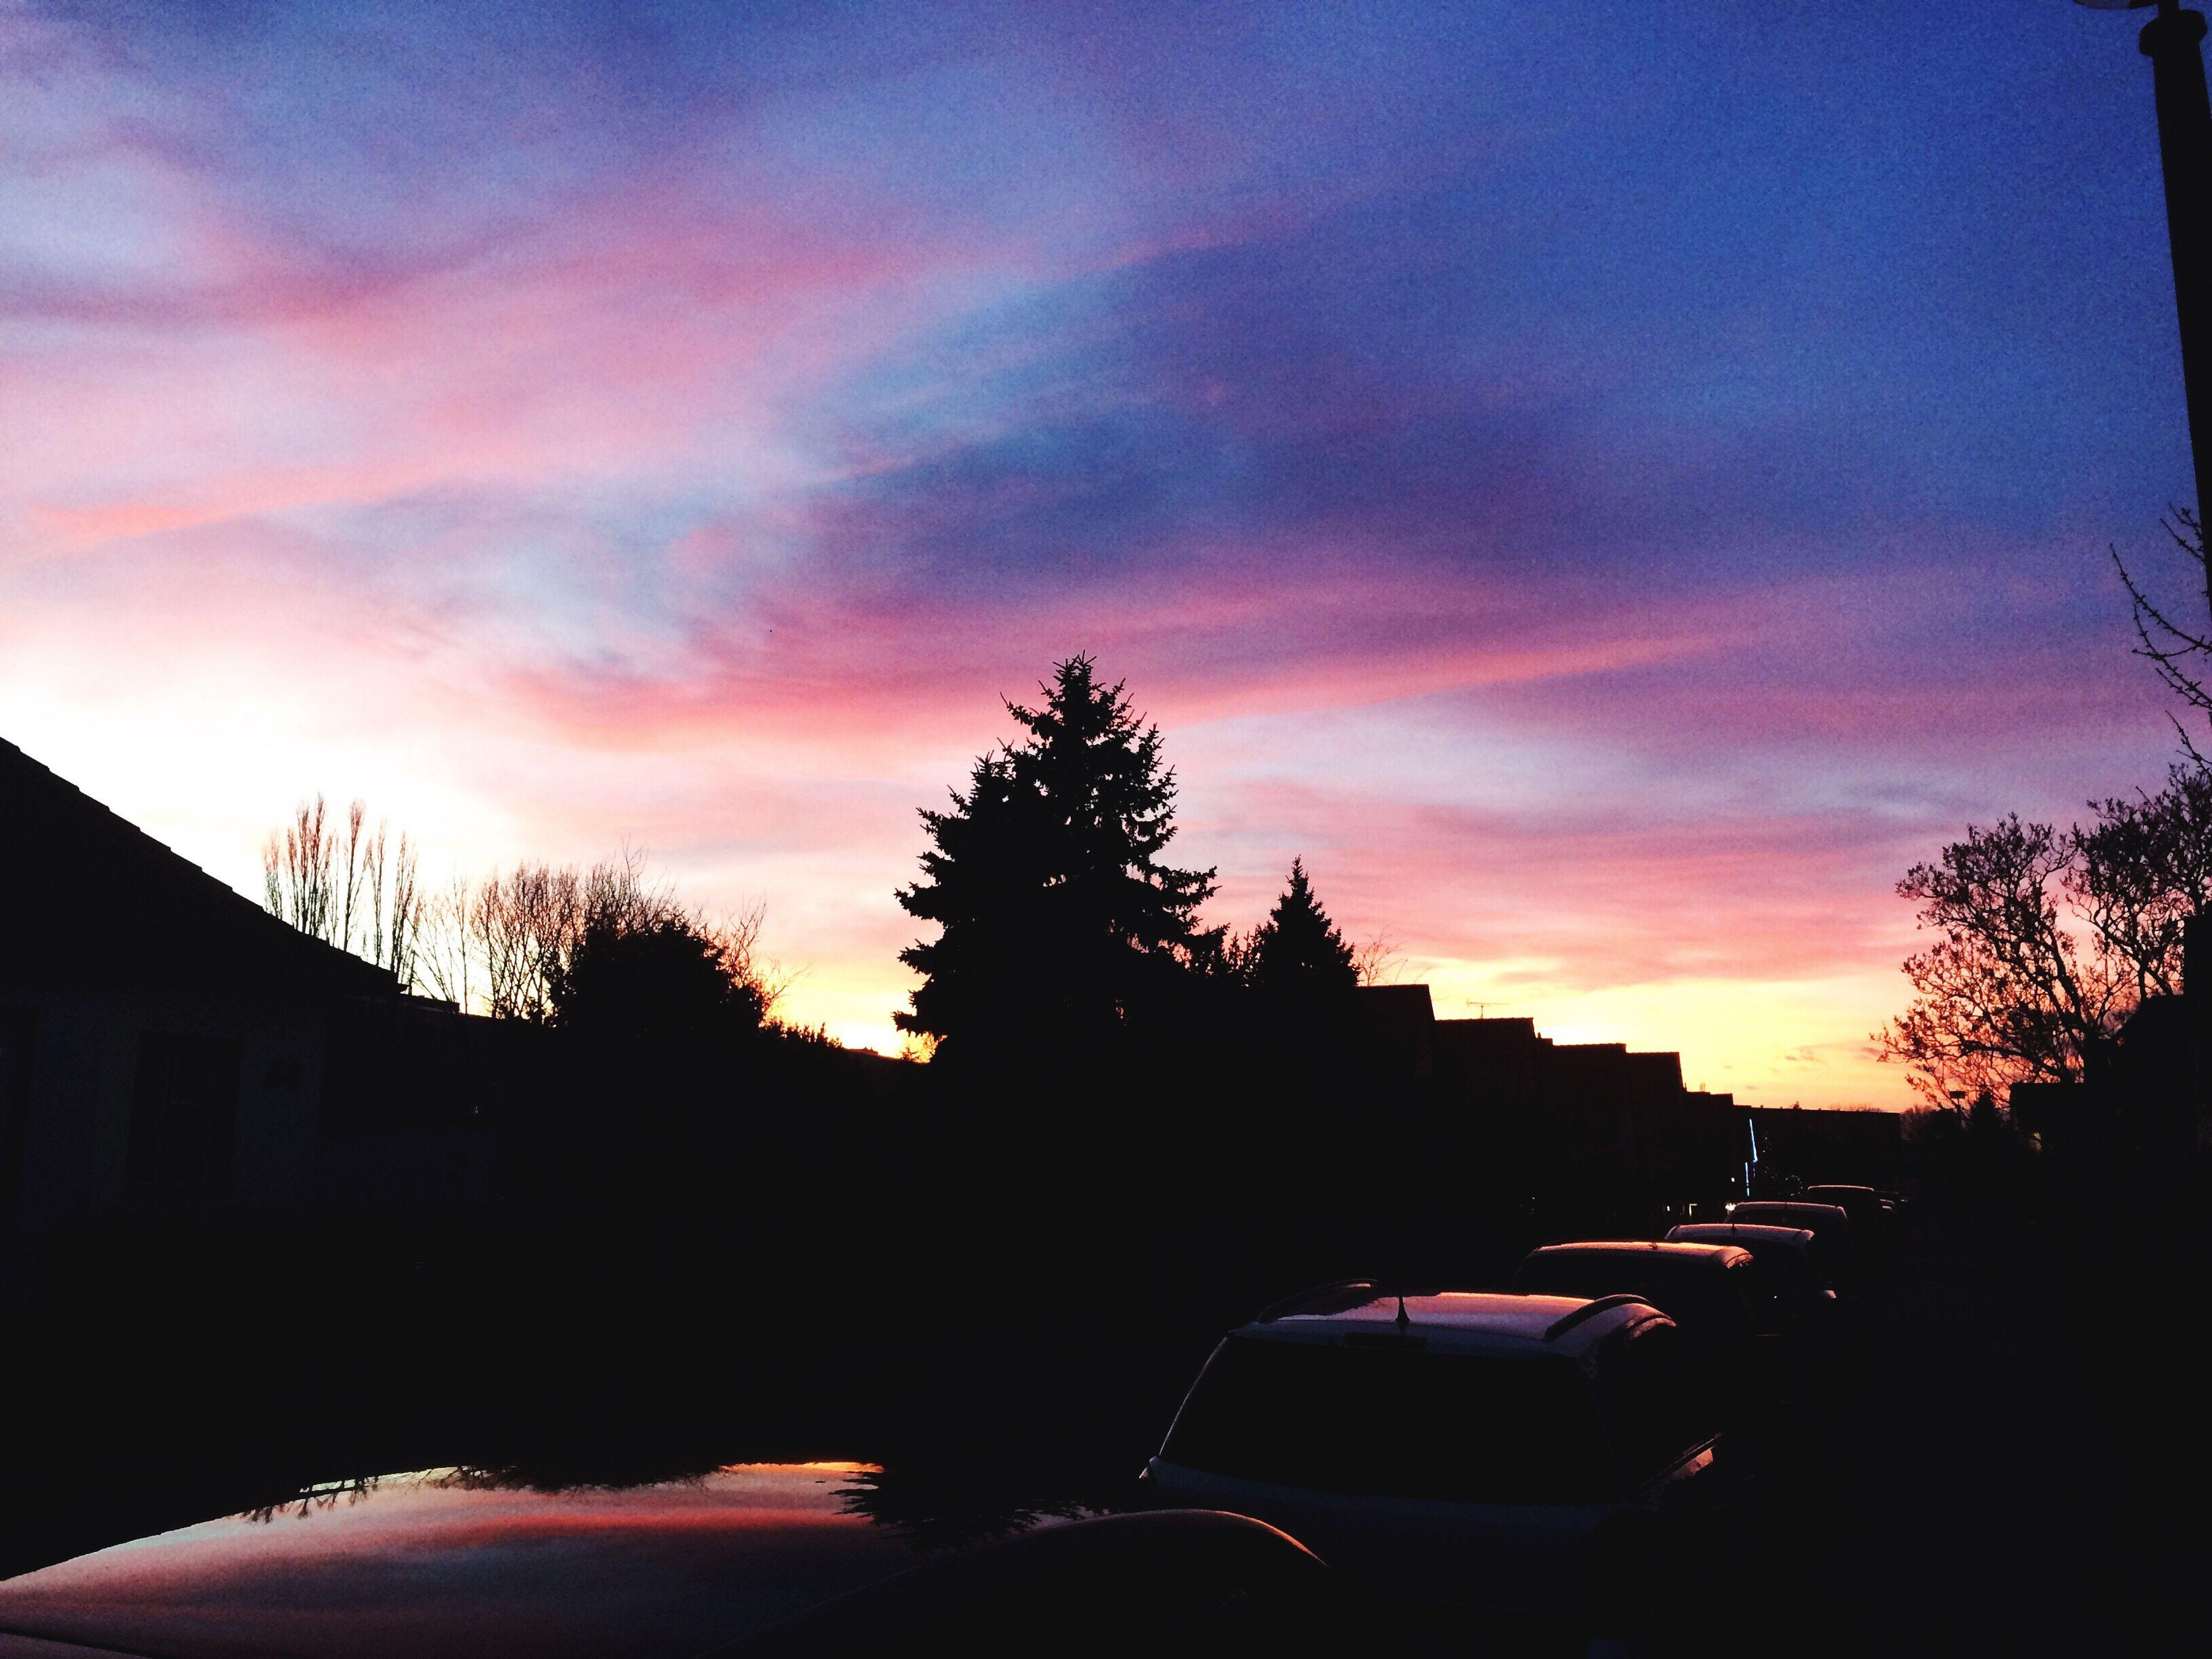 sunset, silhouette, sky, tree, building exterior, orange color, built structure, cloud - sky, architecture, car, land vehicle, dusk, beauty in nature, cloud, transportation, house, nature, outdoors, dramatic sky, dark